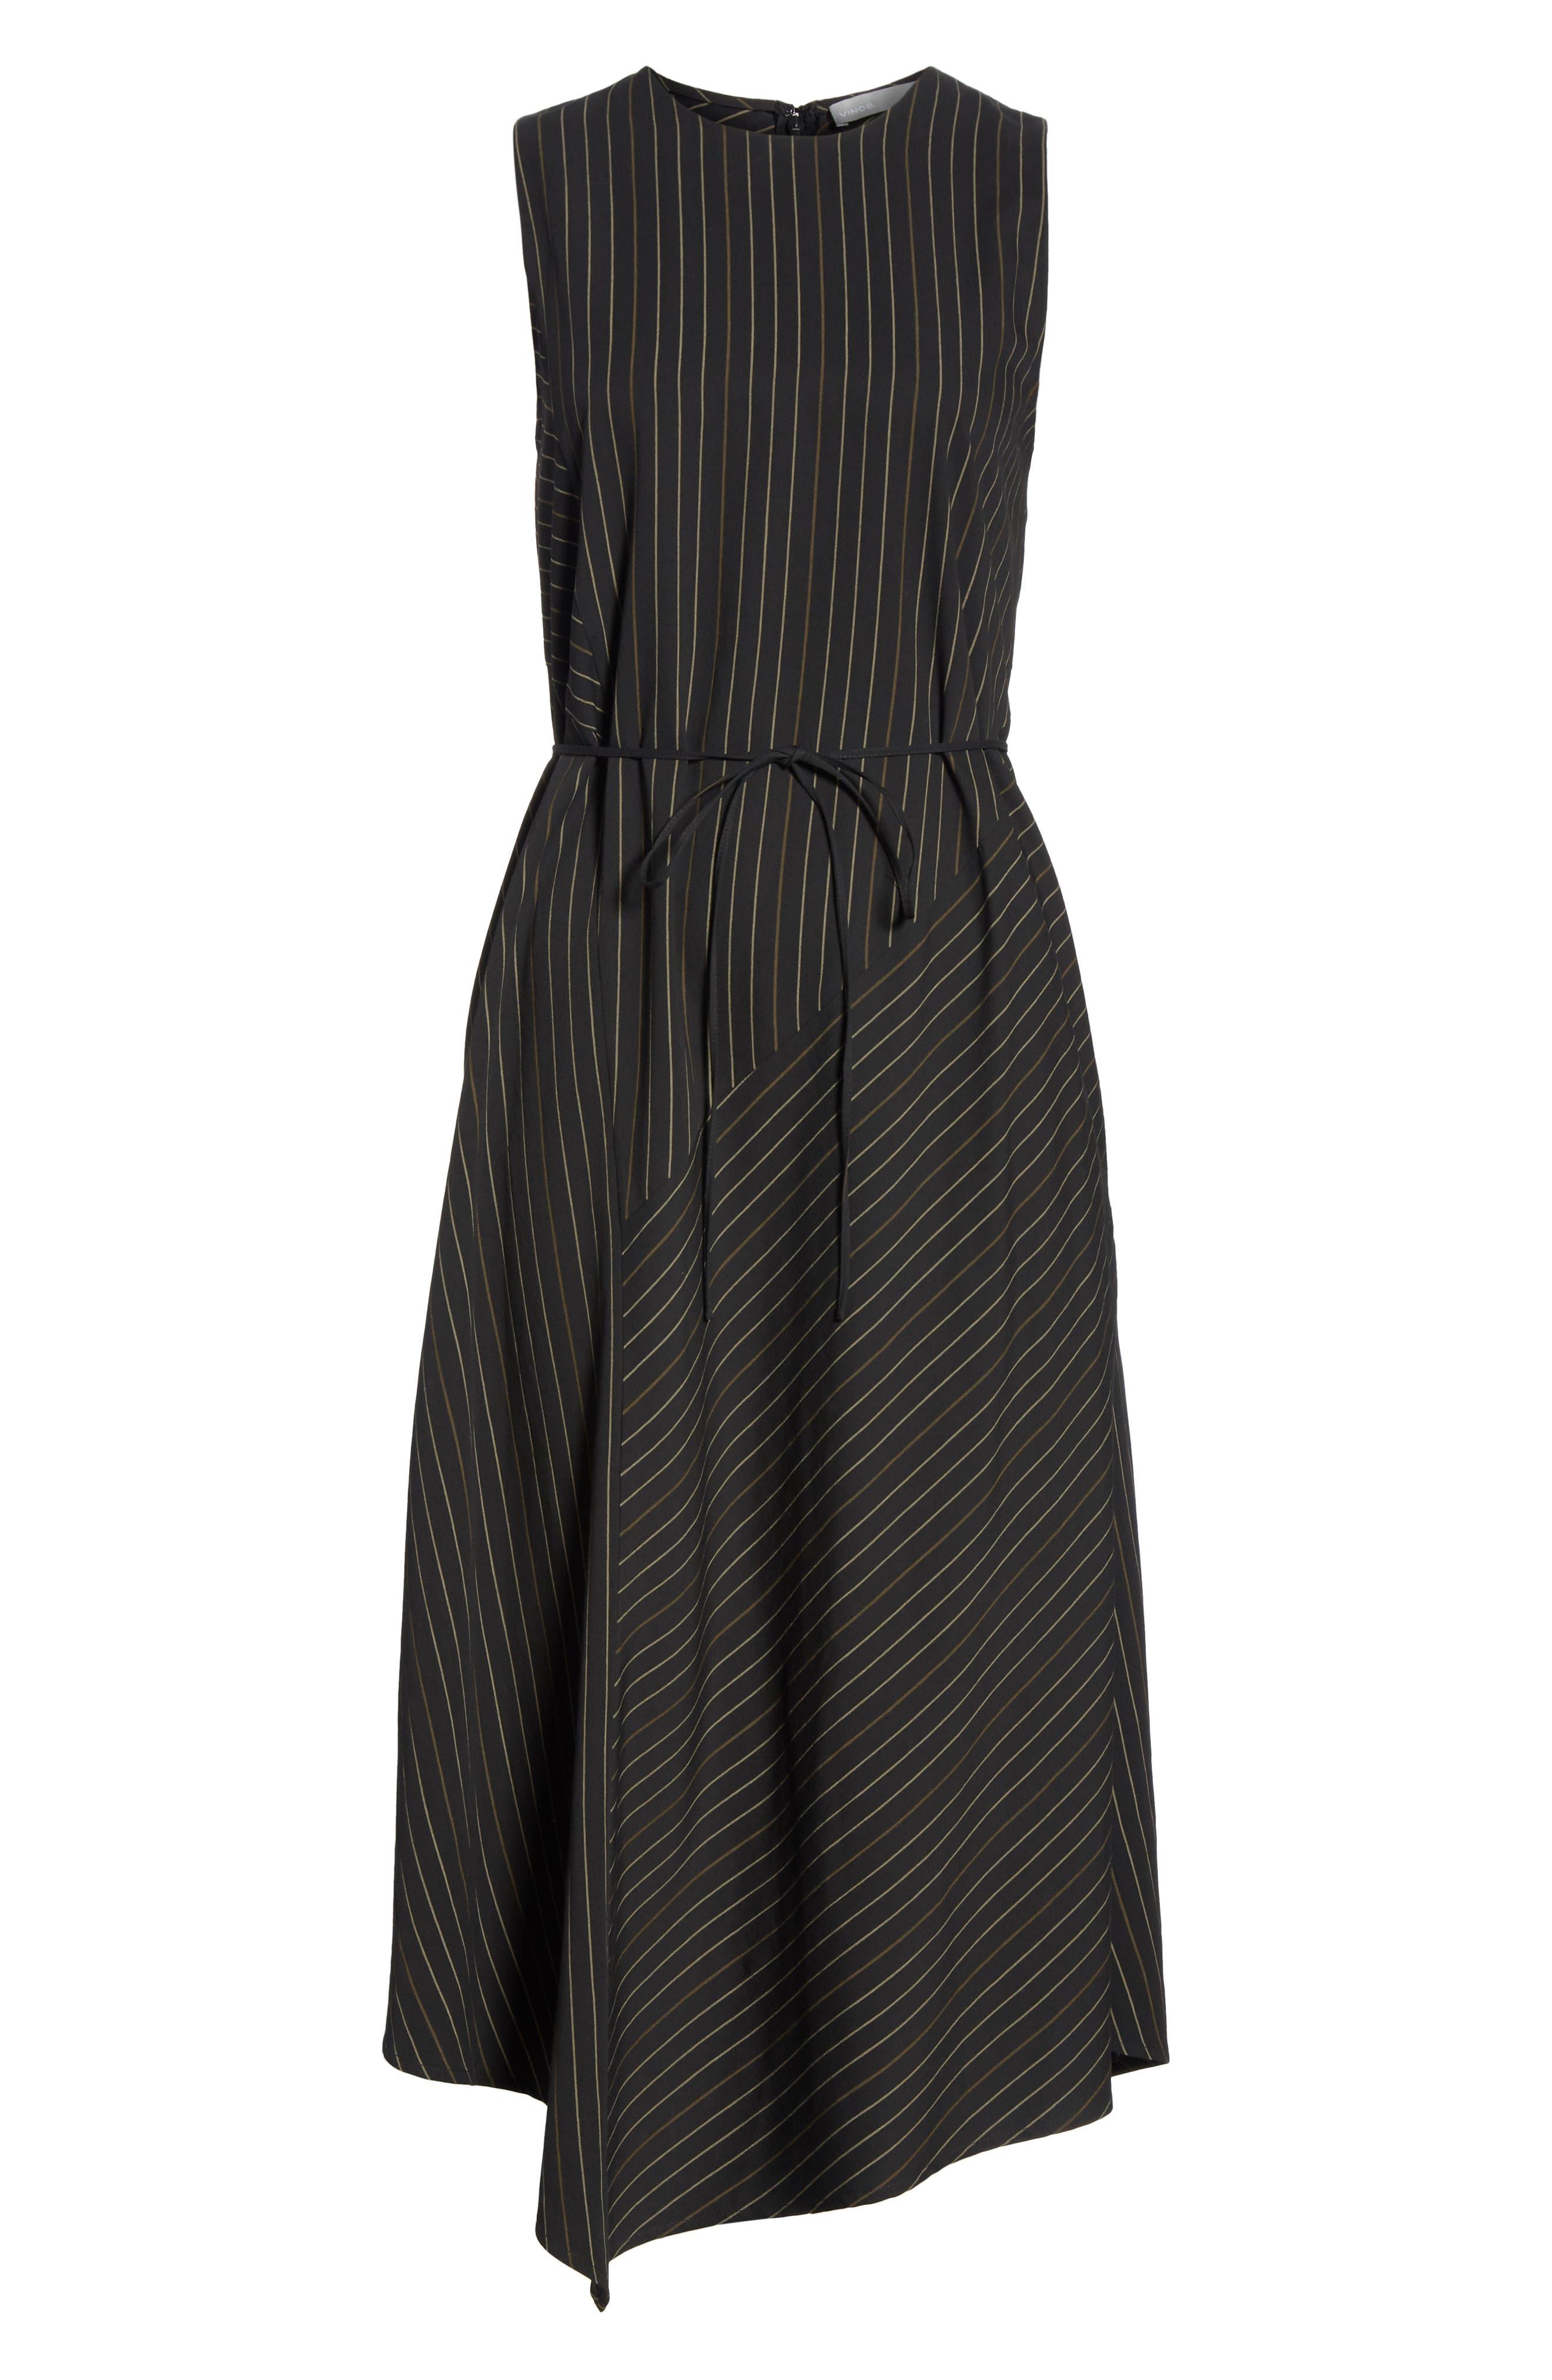 Bar Stripe Paneled Dress,                             Alternate thumbnail 7, color,                             BLACK